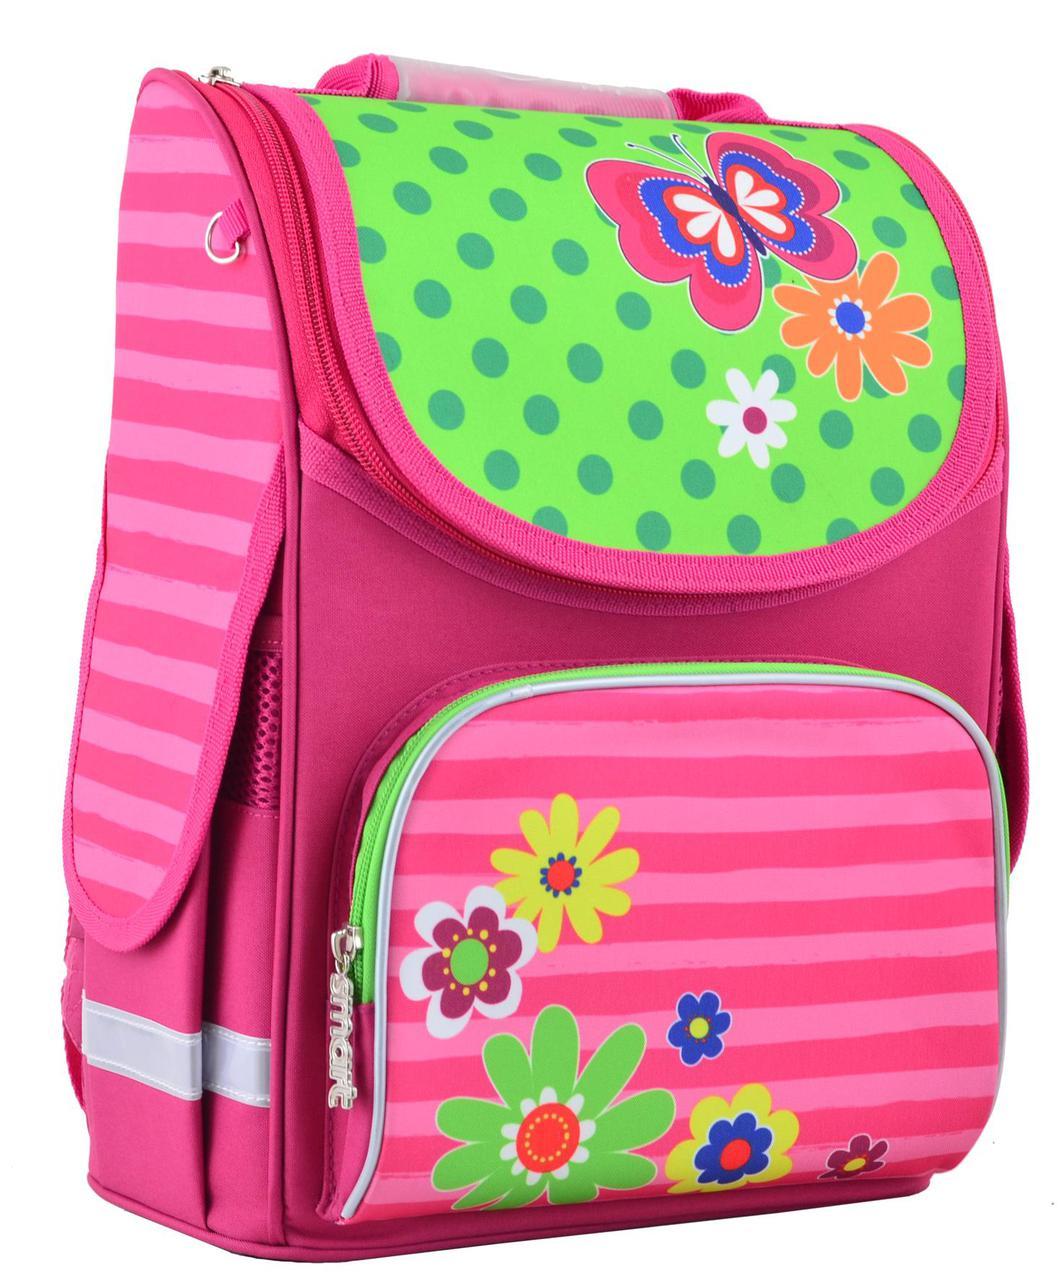 cb5fbd9f052c Рюкзак каркасный 1 вересня Smart PG-11 Flowers 554511 - Интернет-магазин  Kindermir.